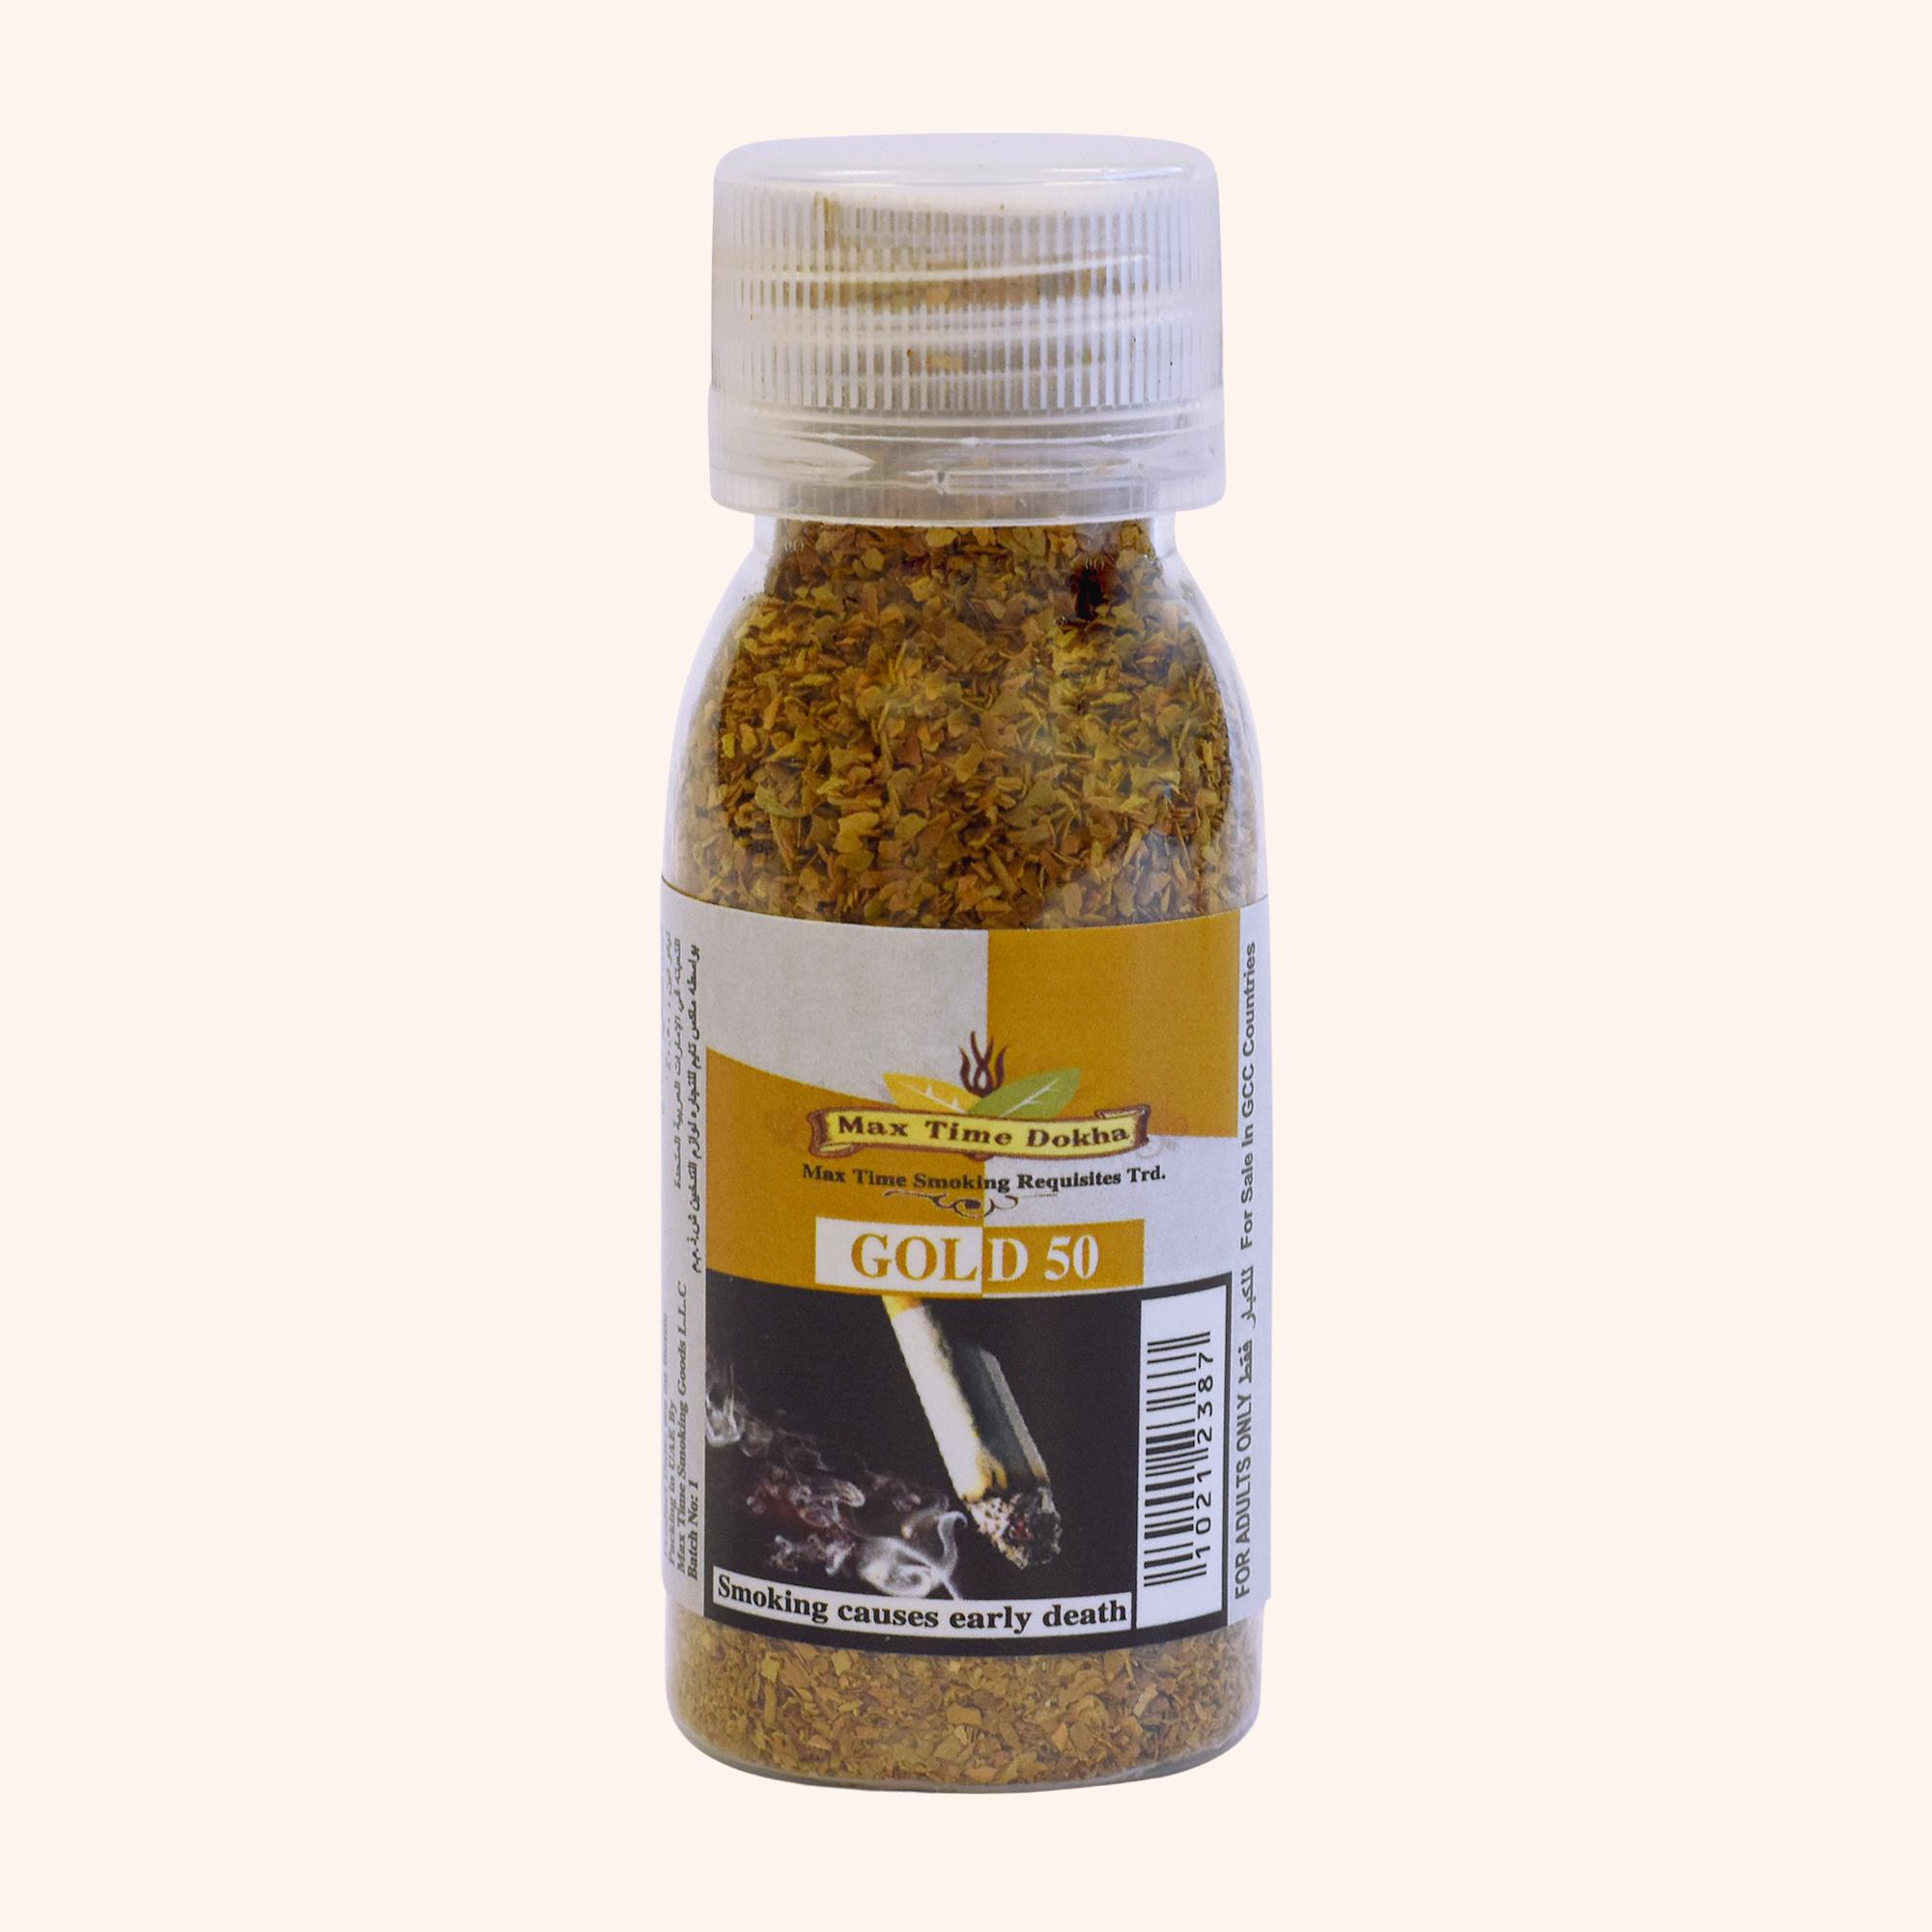 Max Time Gold 50 Medium Dokha – 50ml / 14g